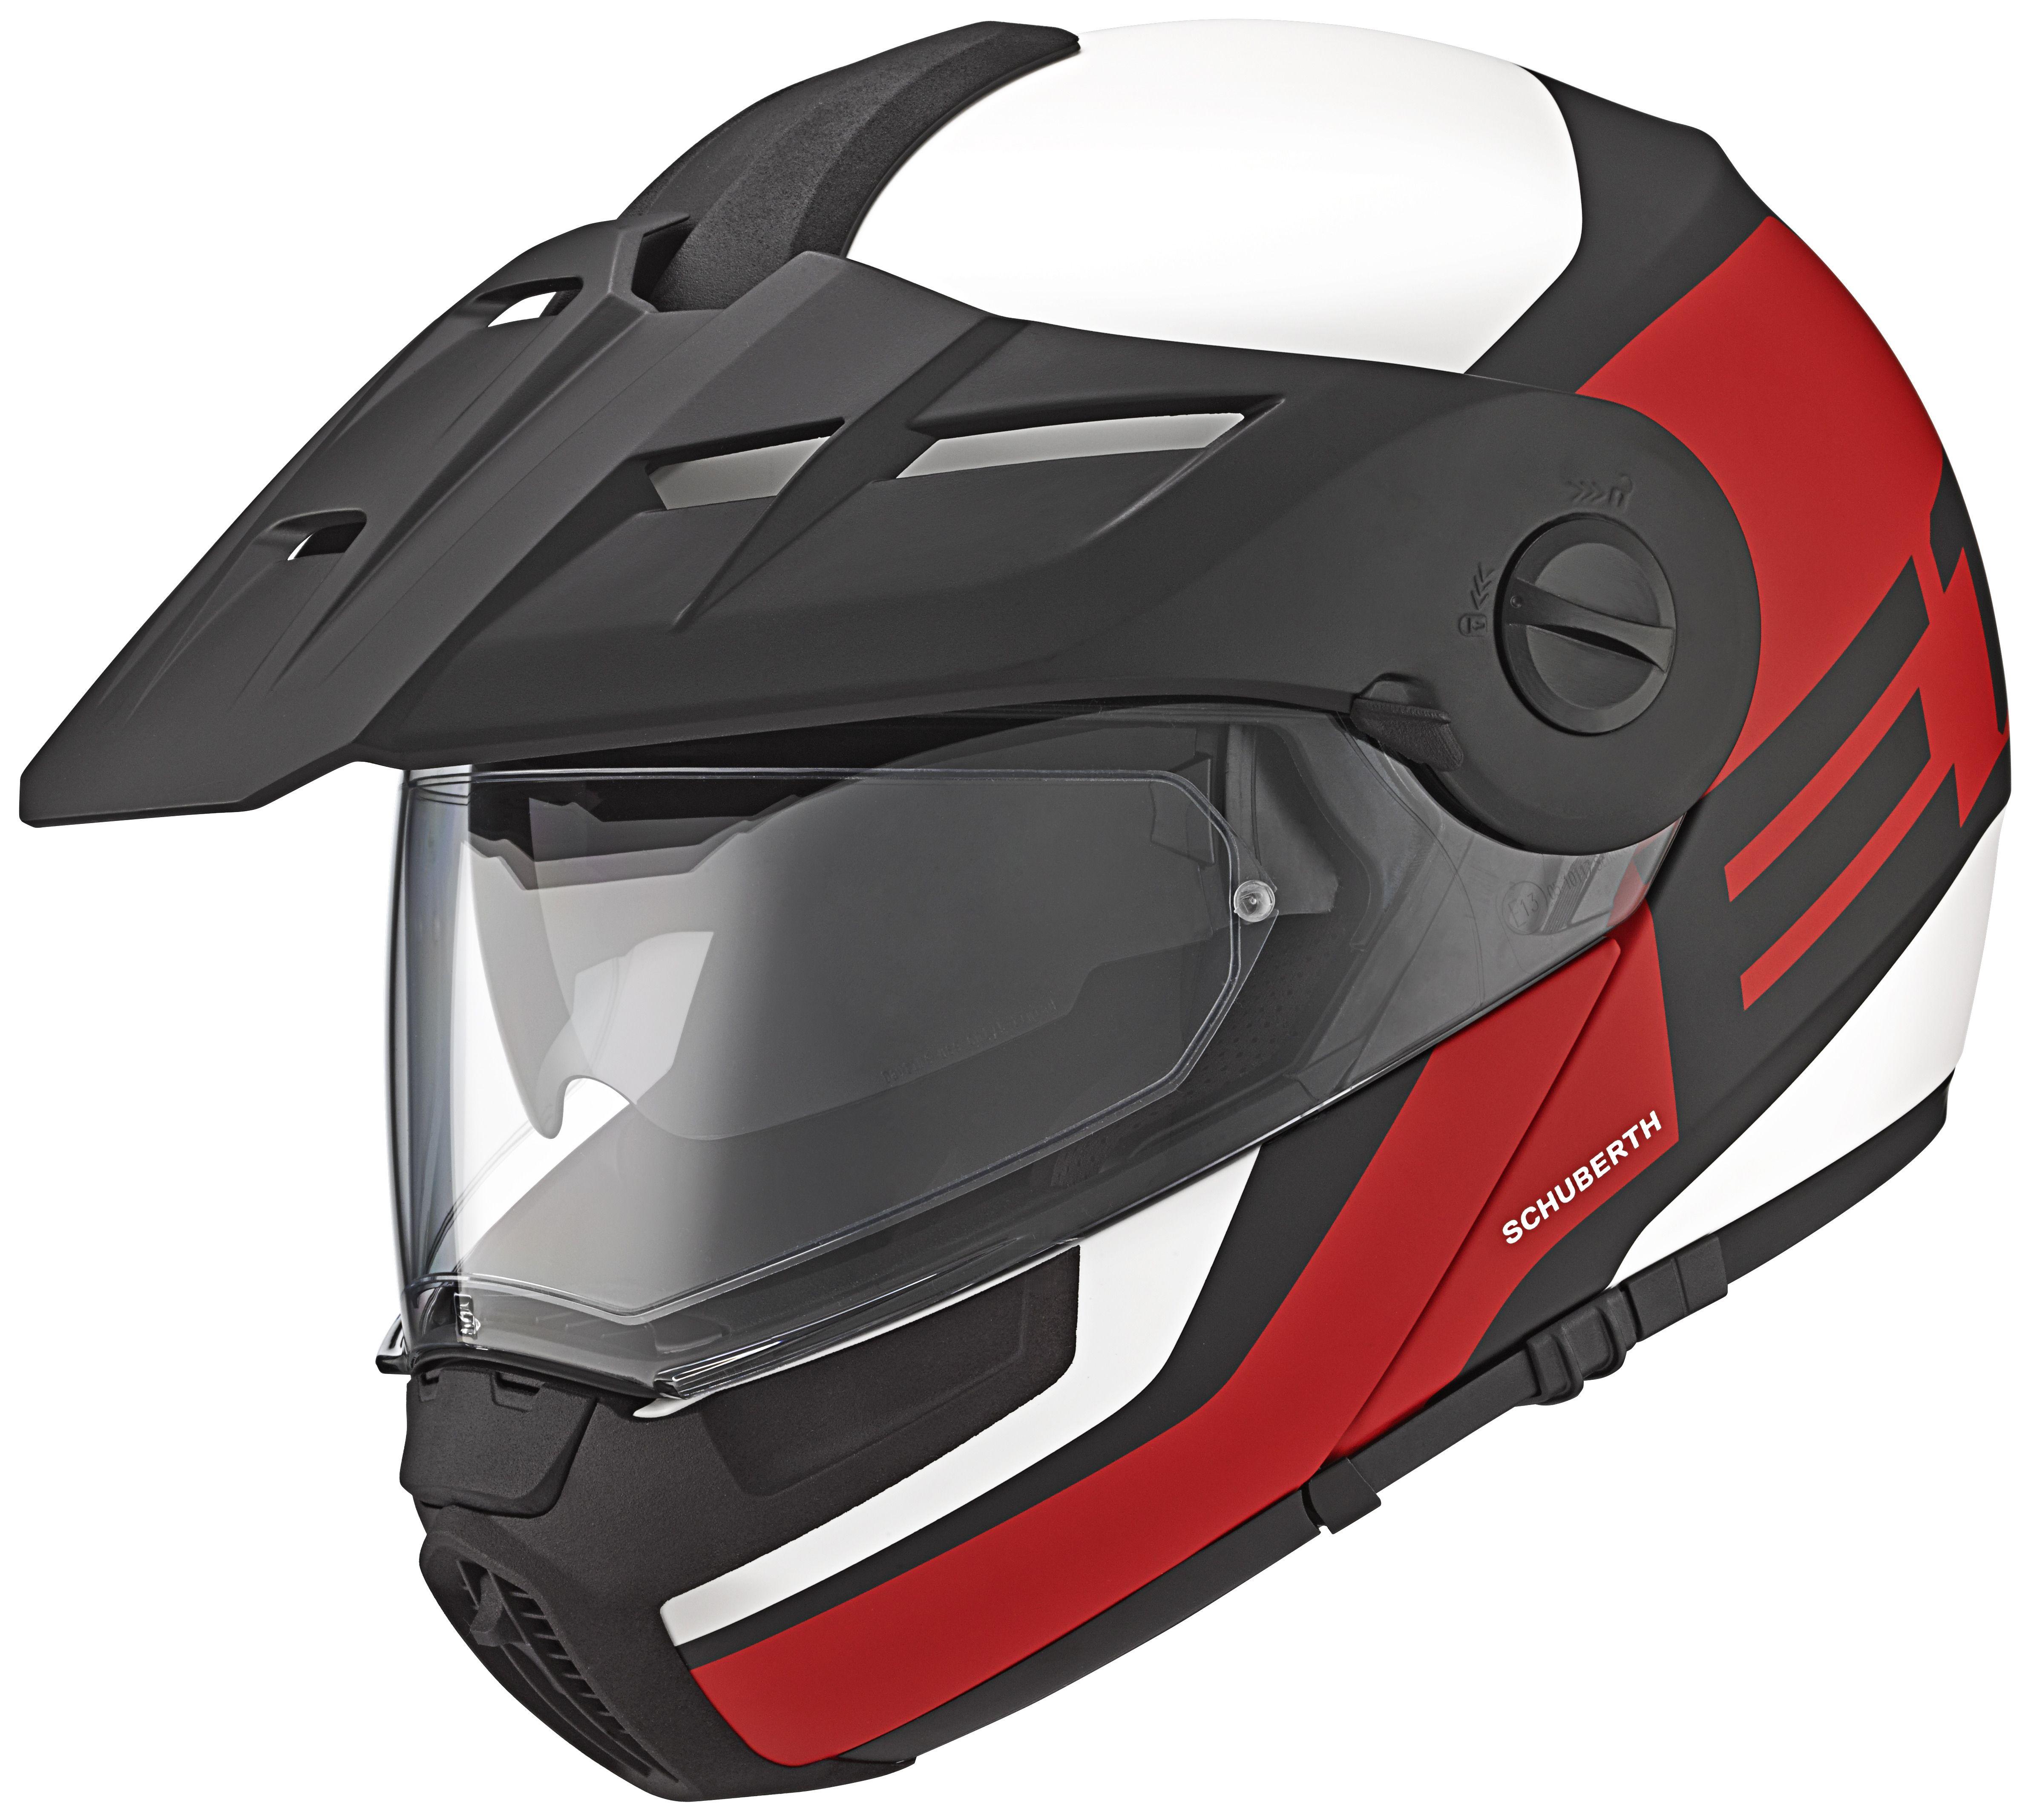 Schuberth E Guardian Helmet RevZilla - Motorcycle helmet decals graphicsmotorcycle helmet graphics the easy helmet upgrade